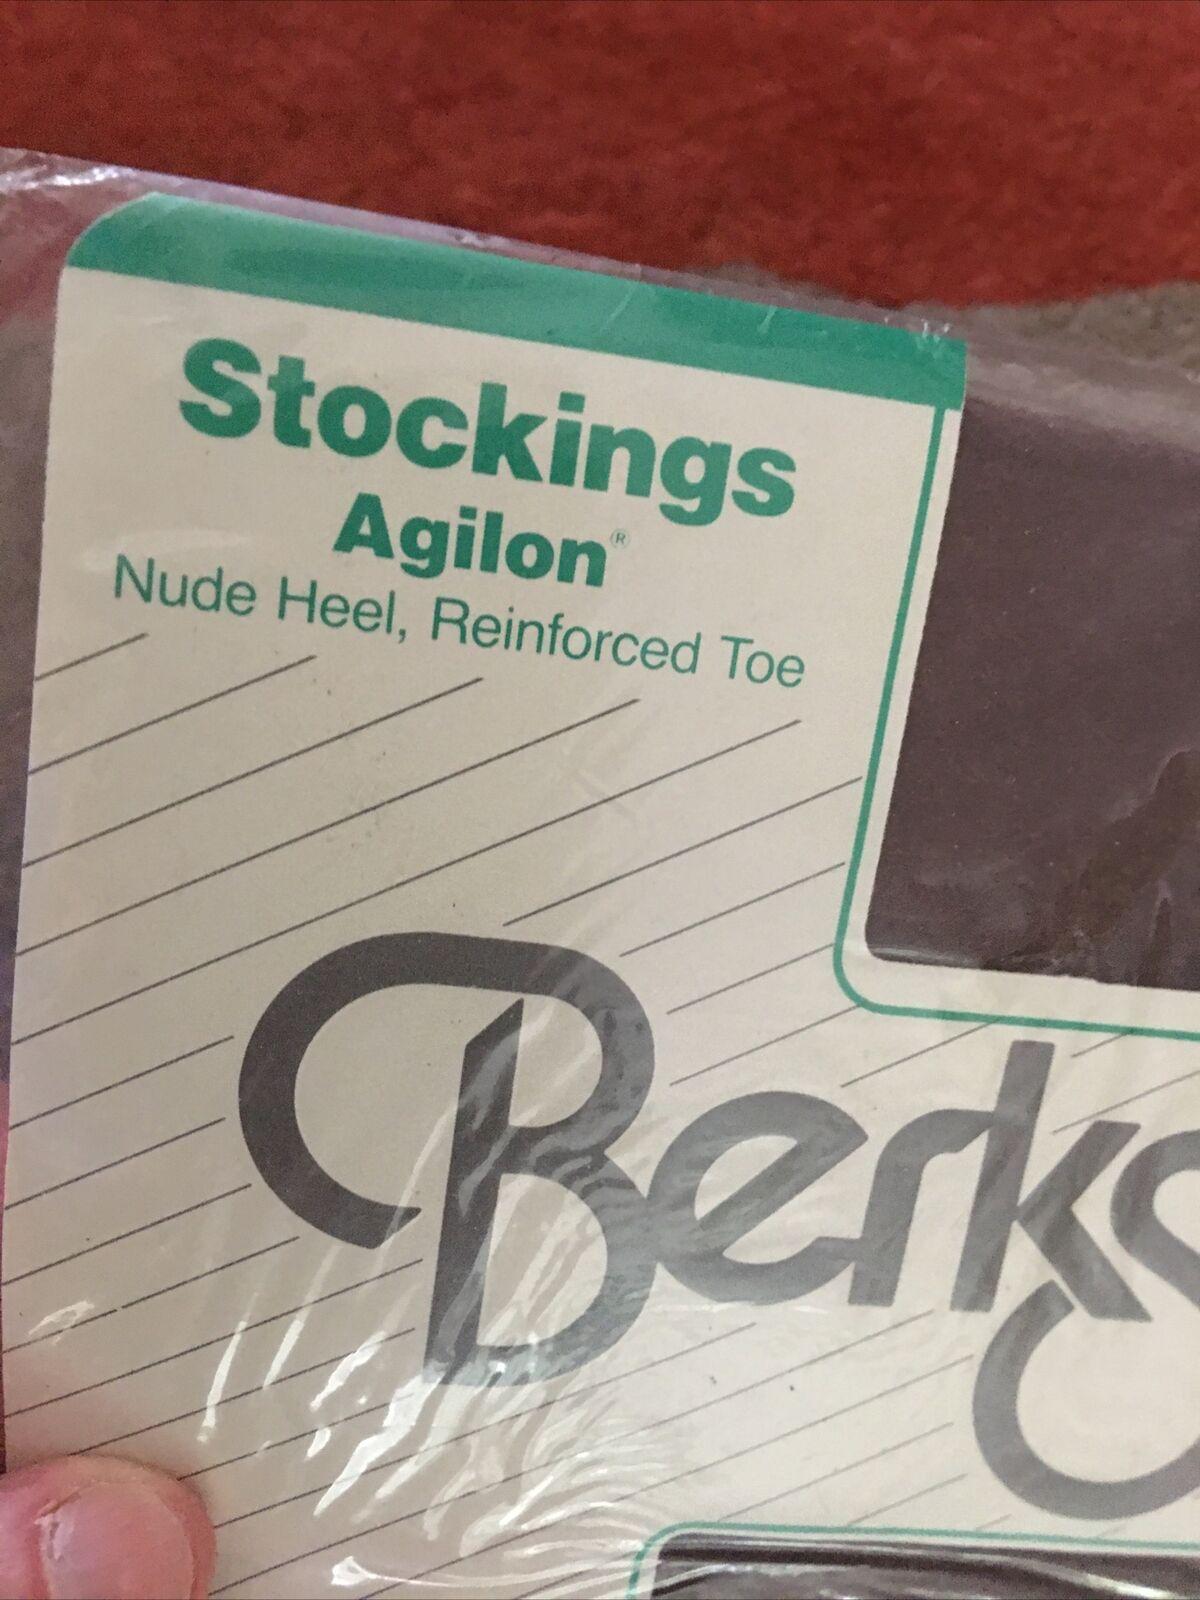 (1) Pr BERKSHIRE Stockings Nude Heel Reinforced Toe UTOPIA Stretch 2 NEW NOS